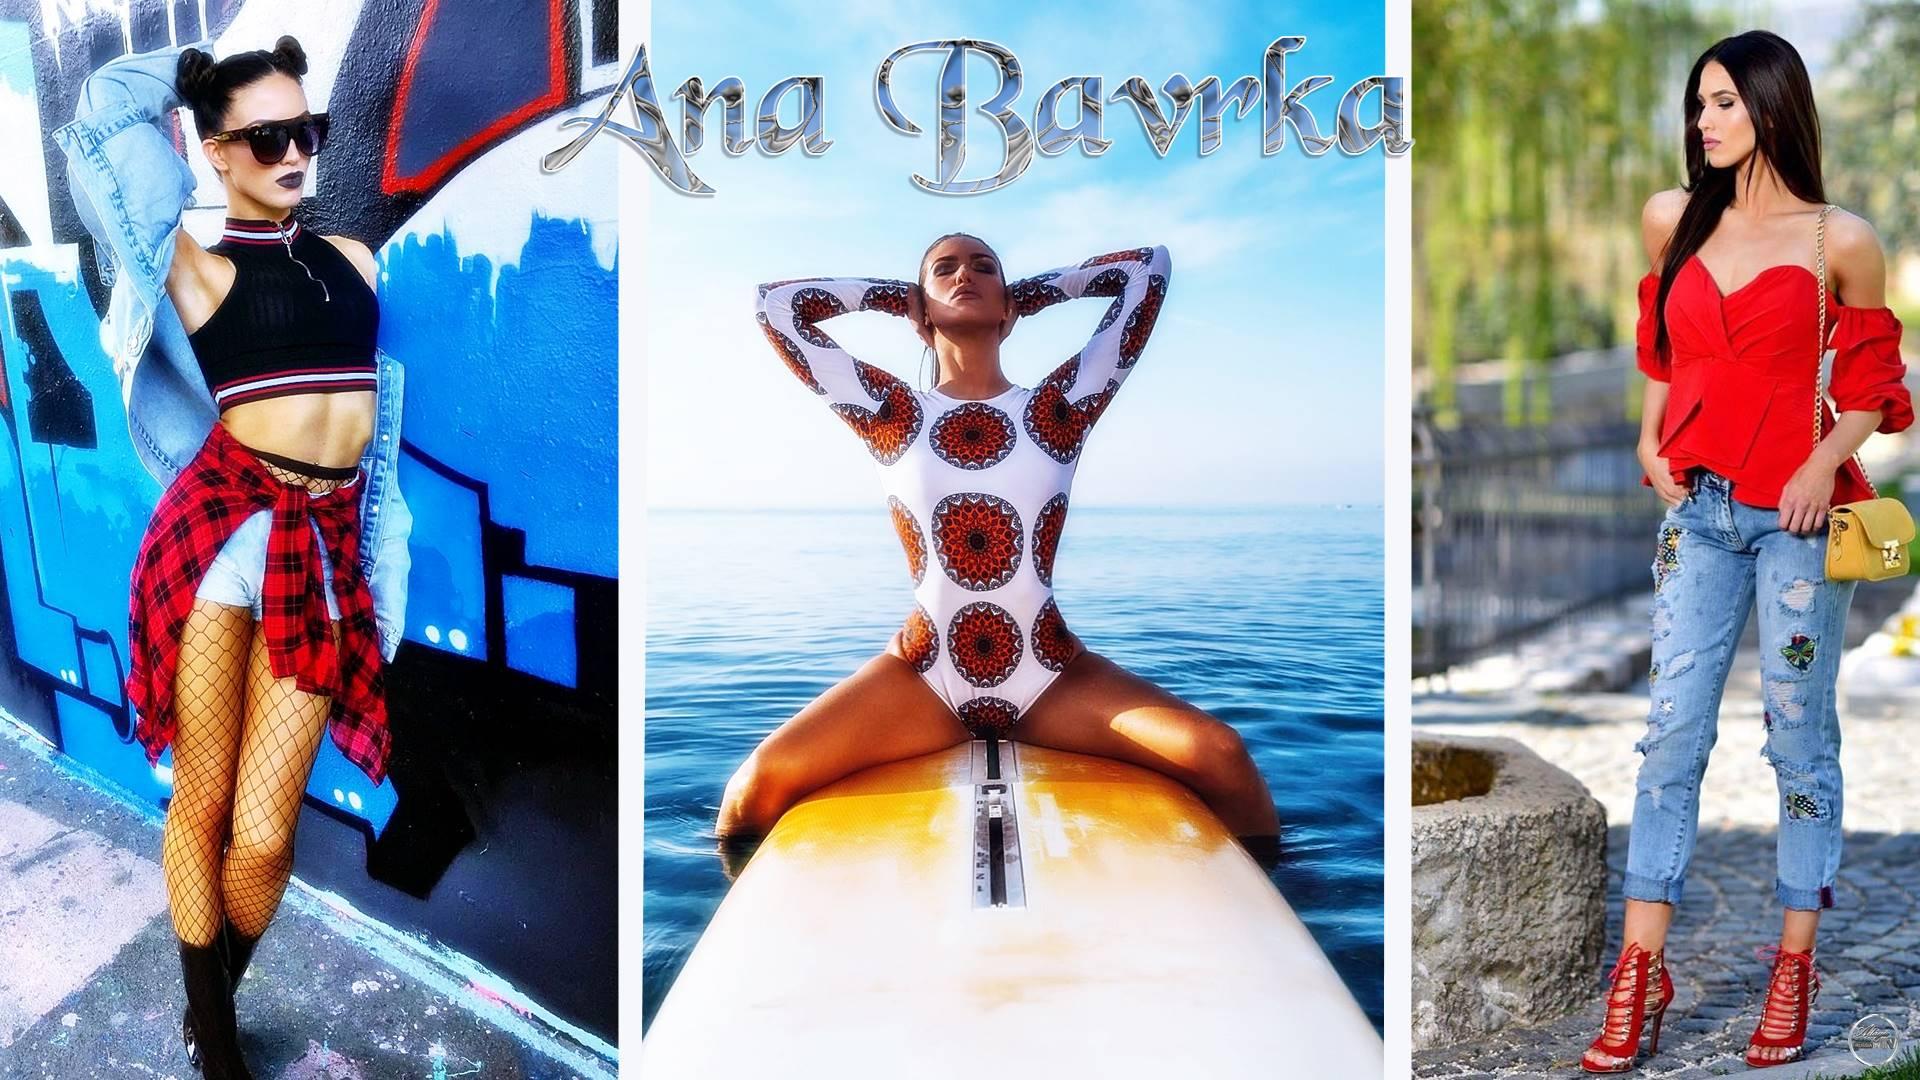 Model: Ana Bavrka